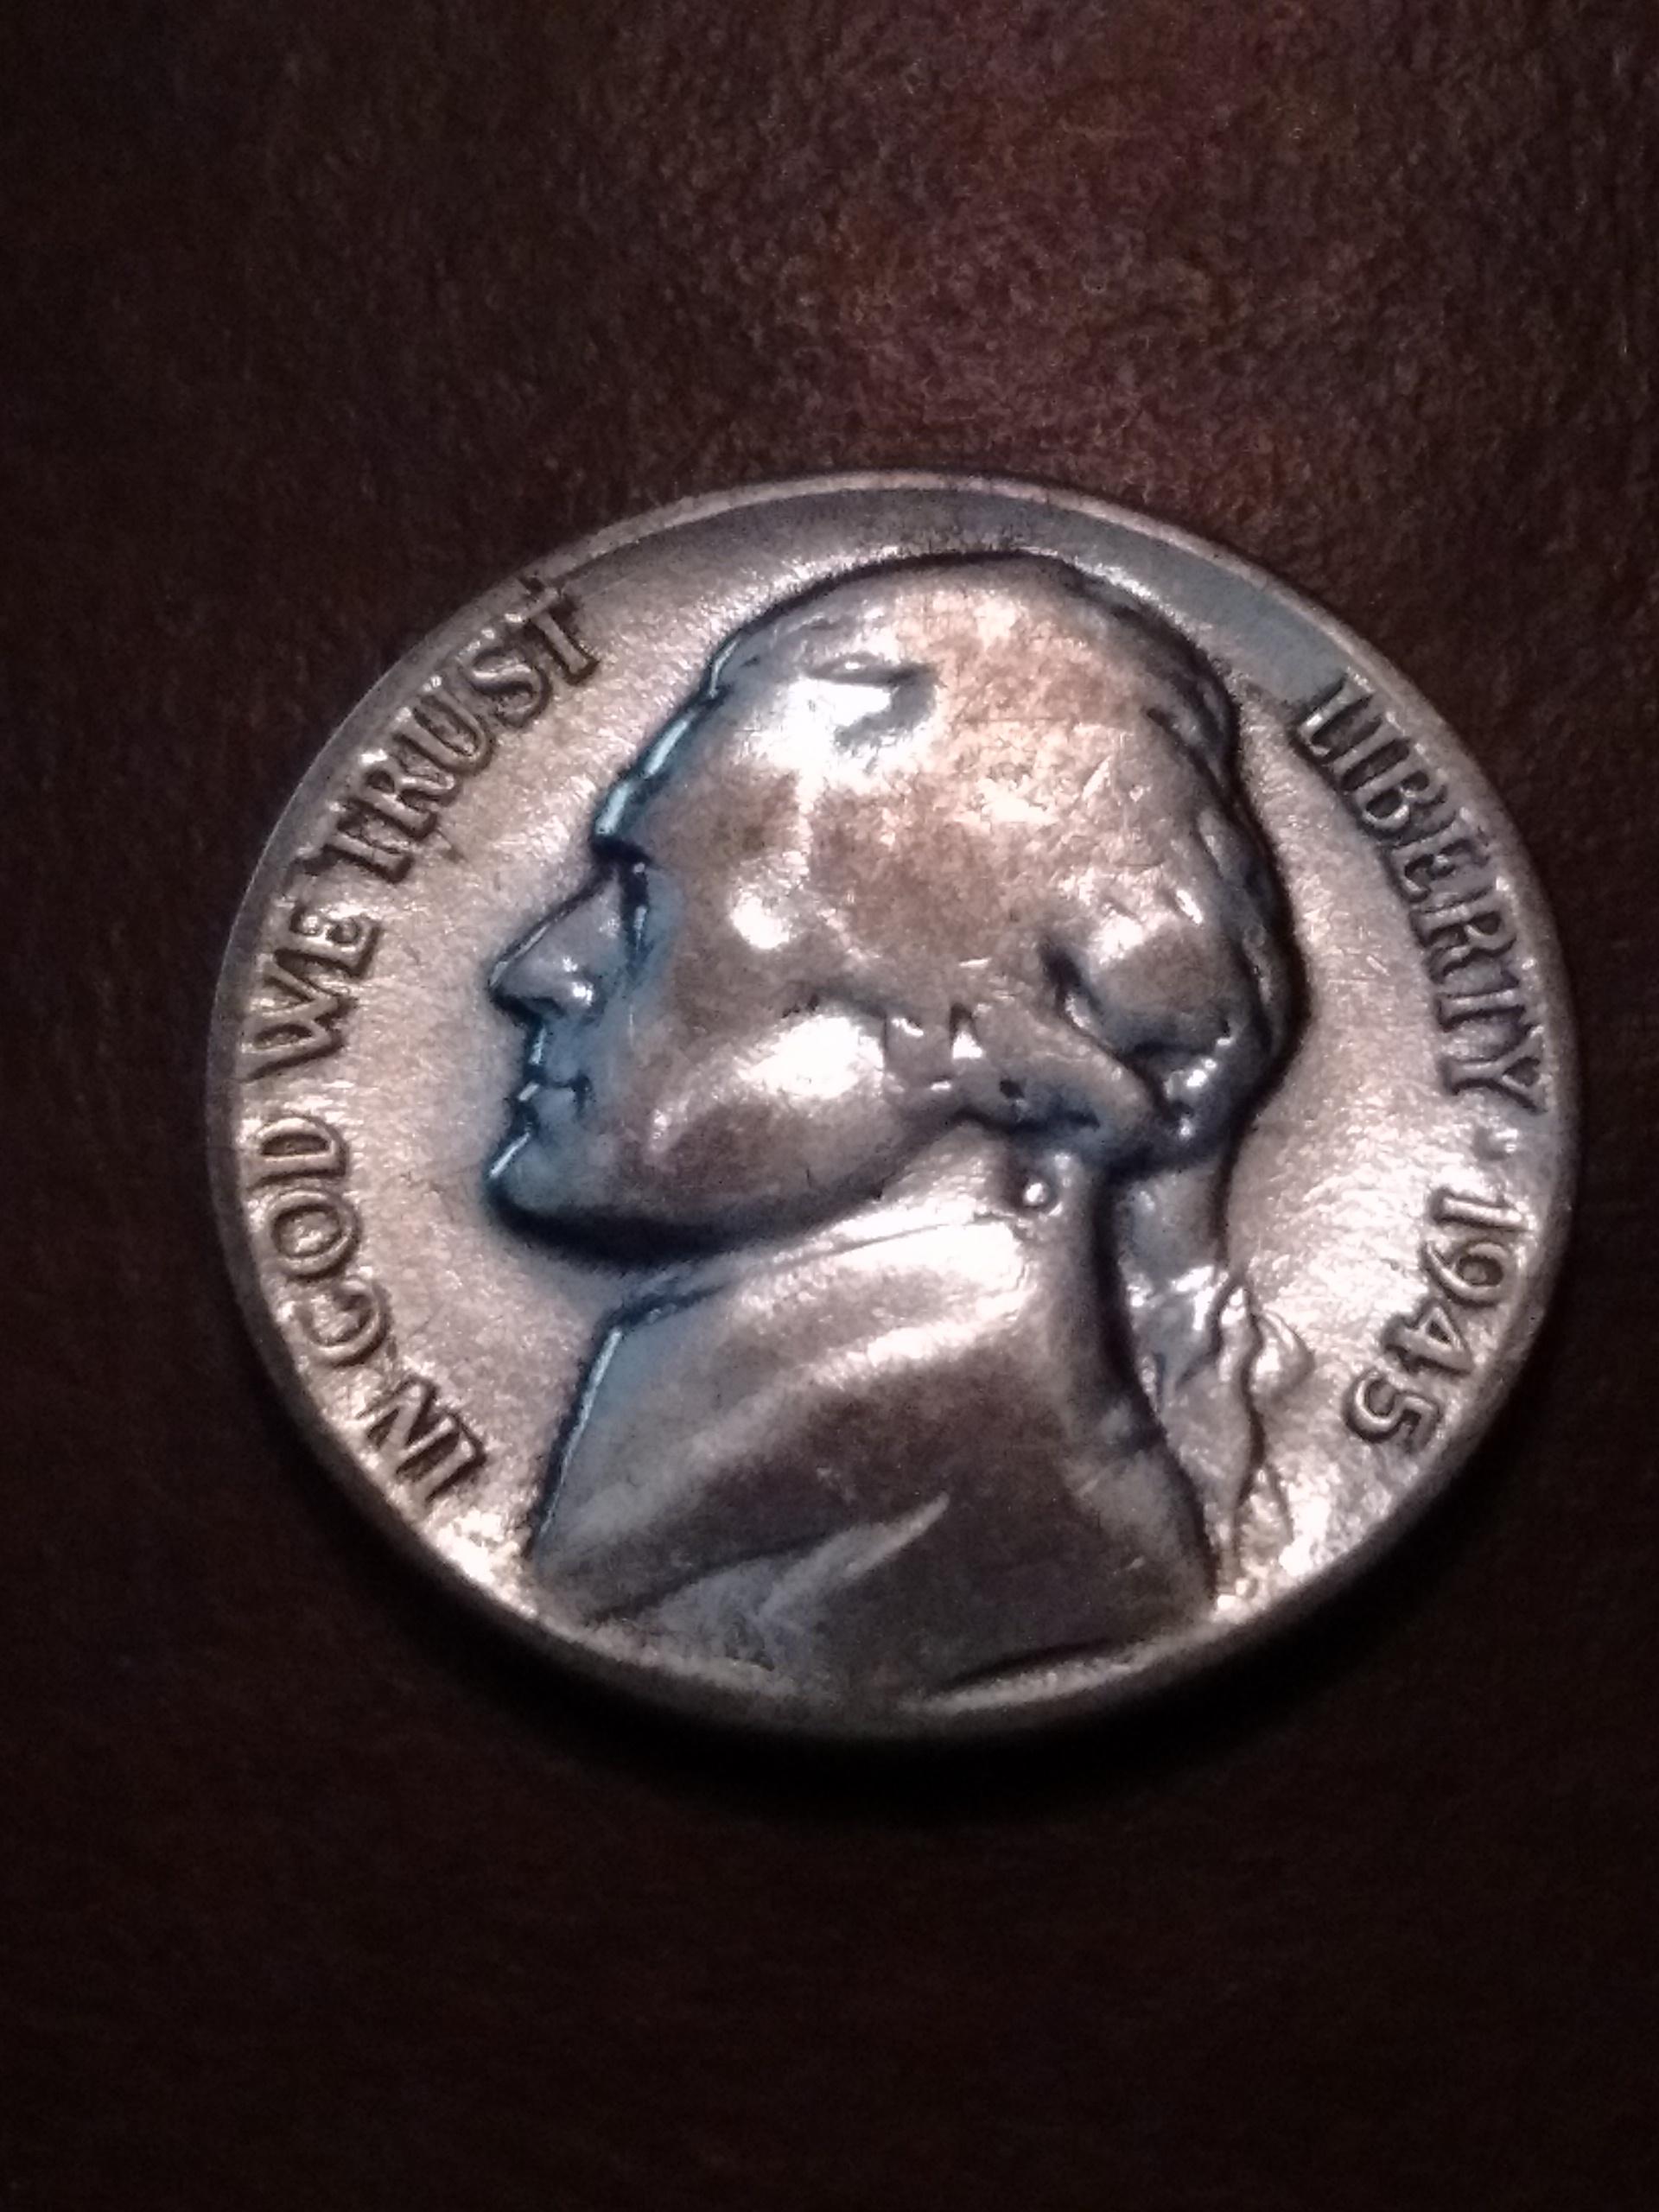 Brownwood Silver Coin Raffle | Raffle Creator